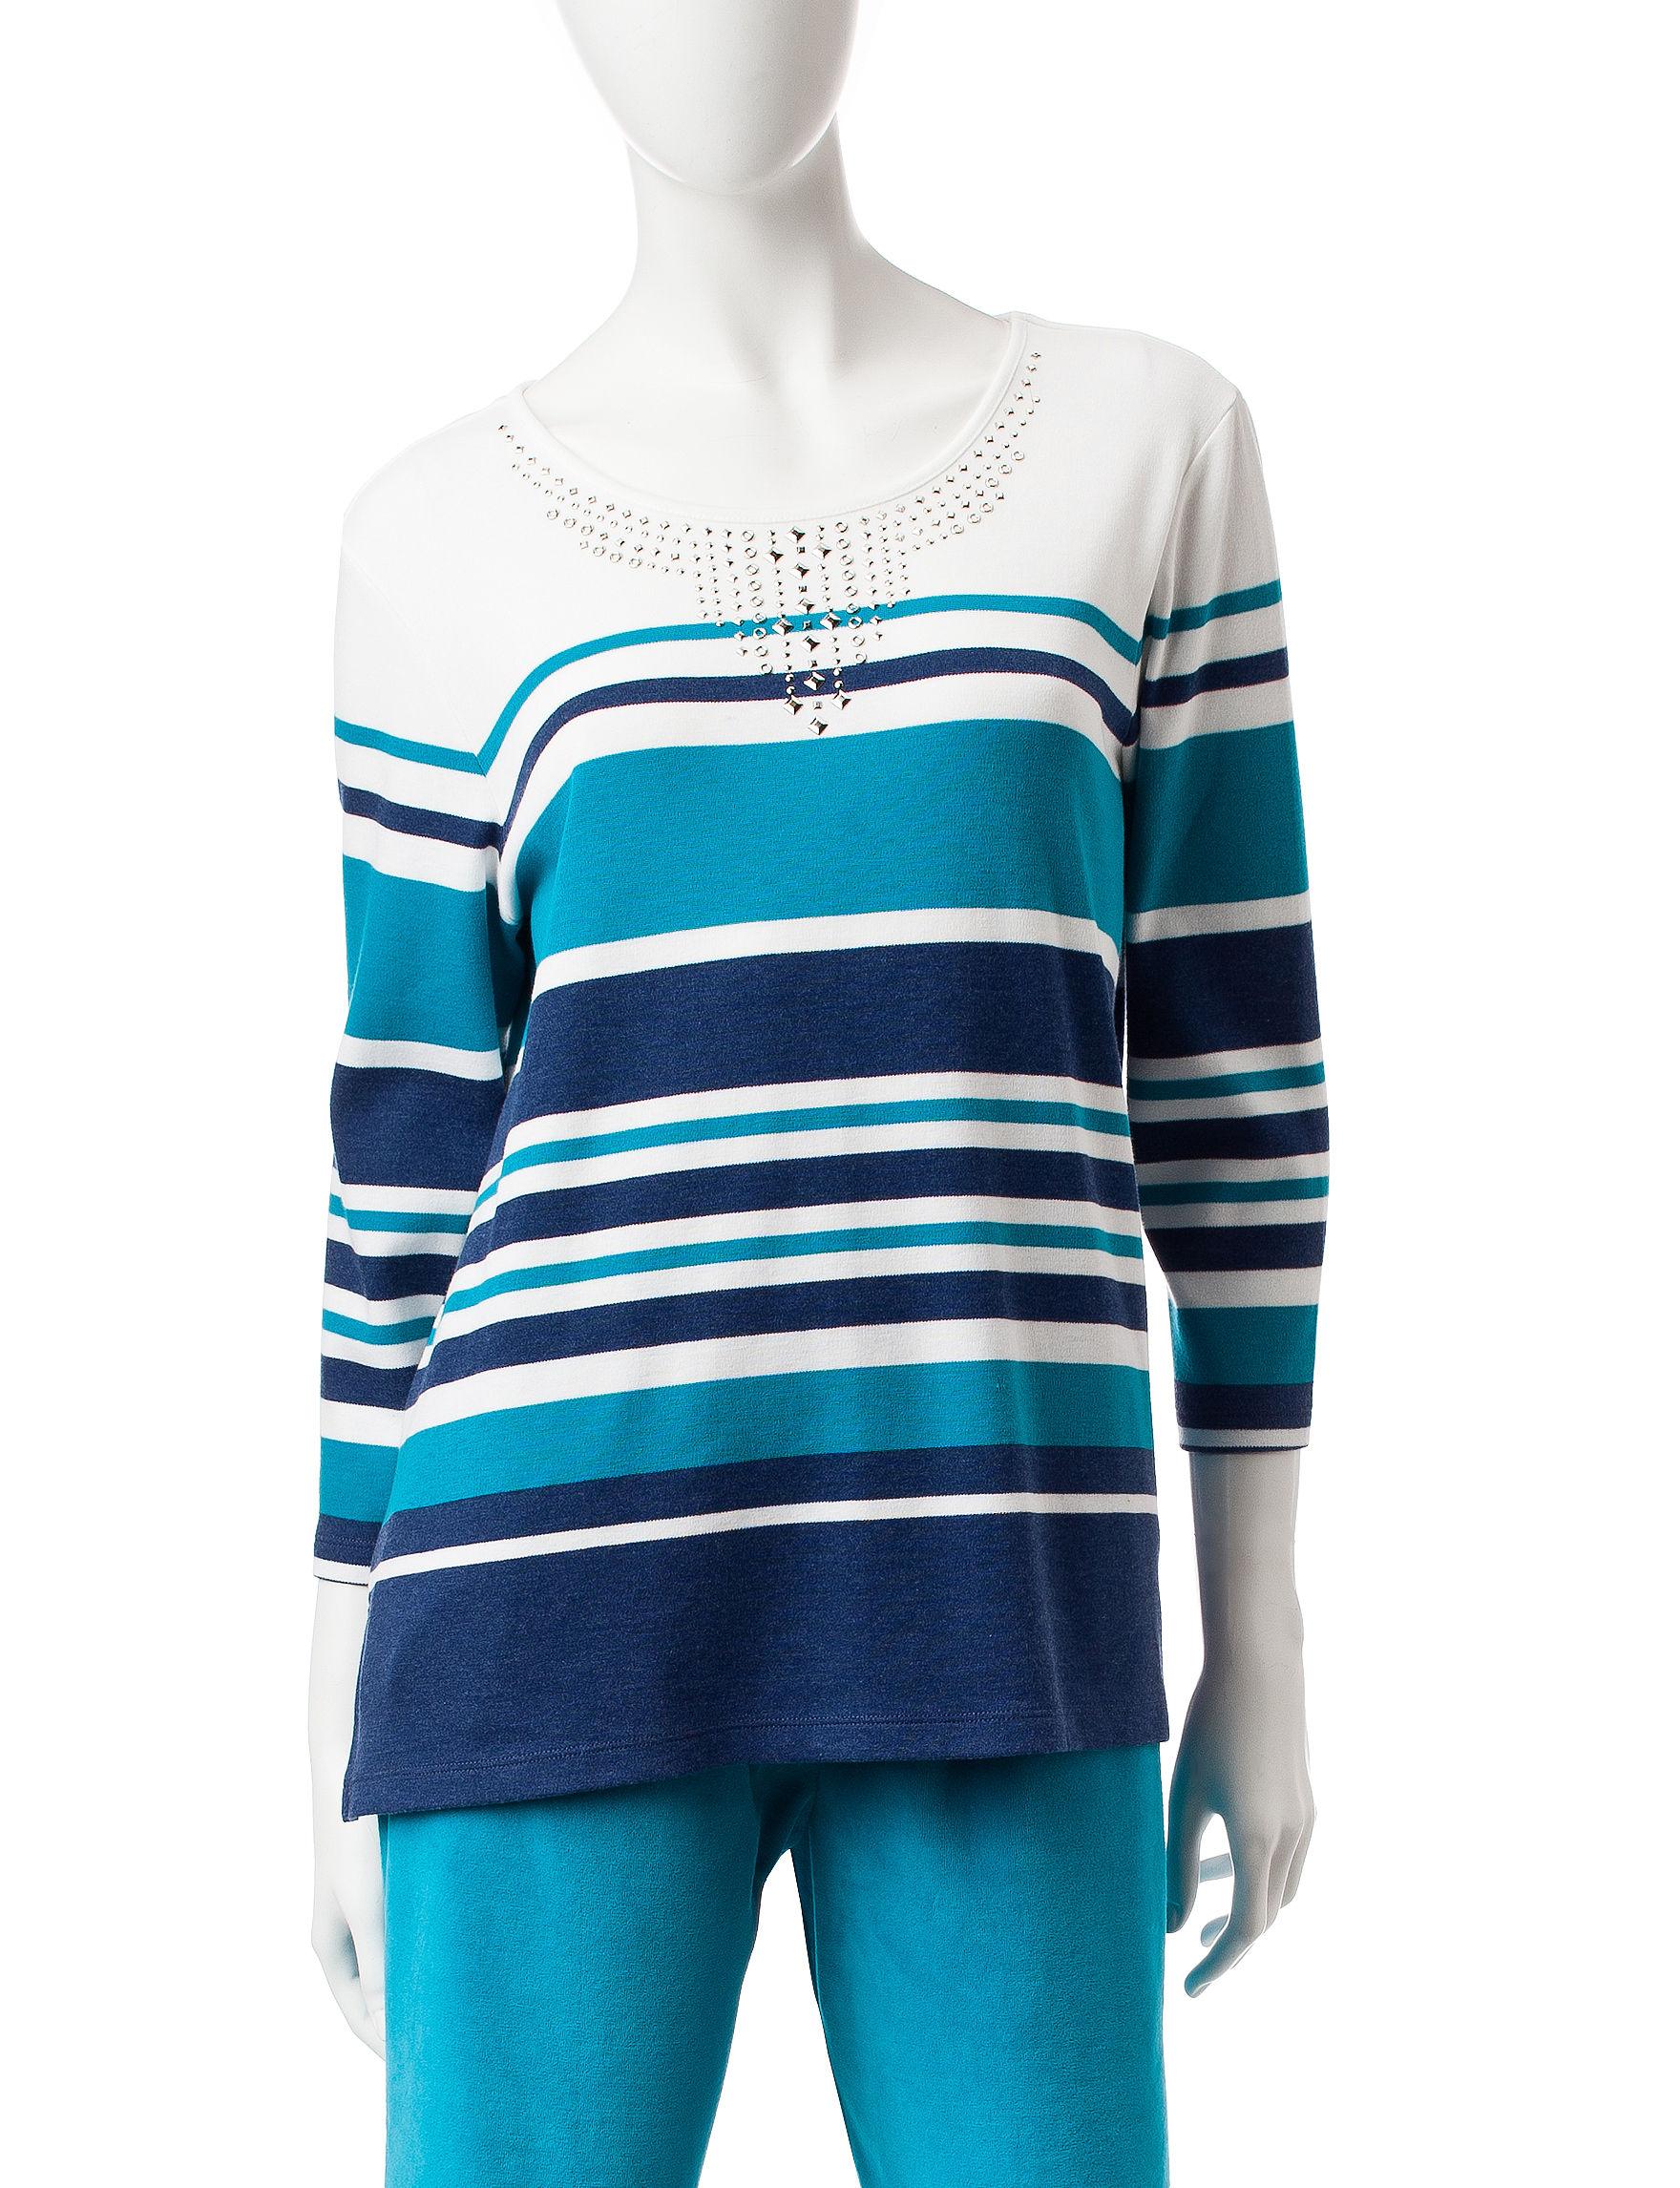 Alfred Dunner Stripe / Multi Shirts & Blouses